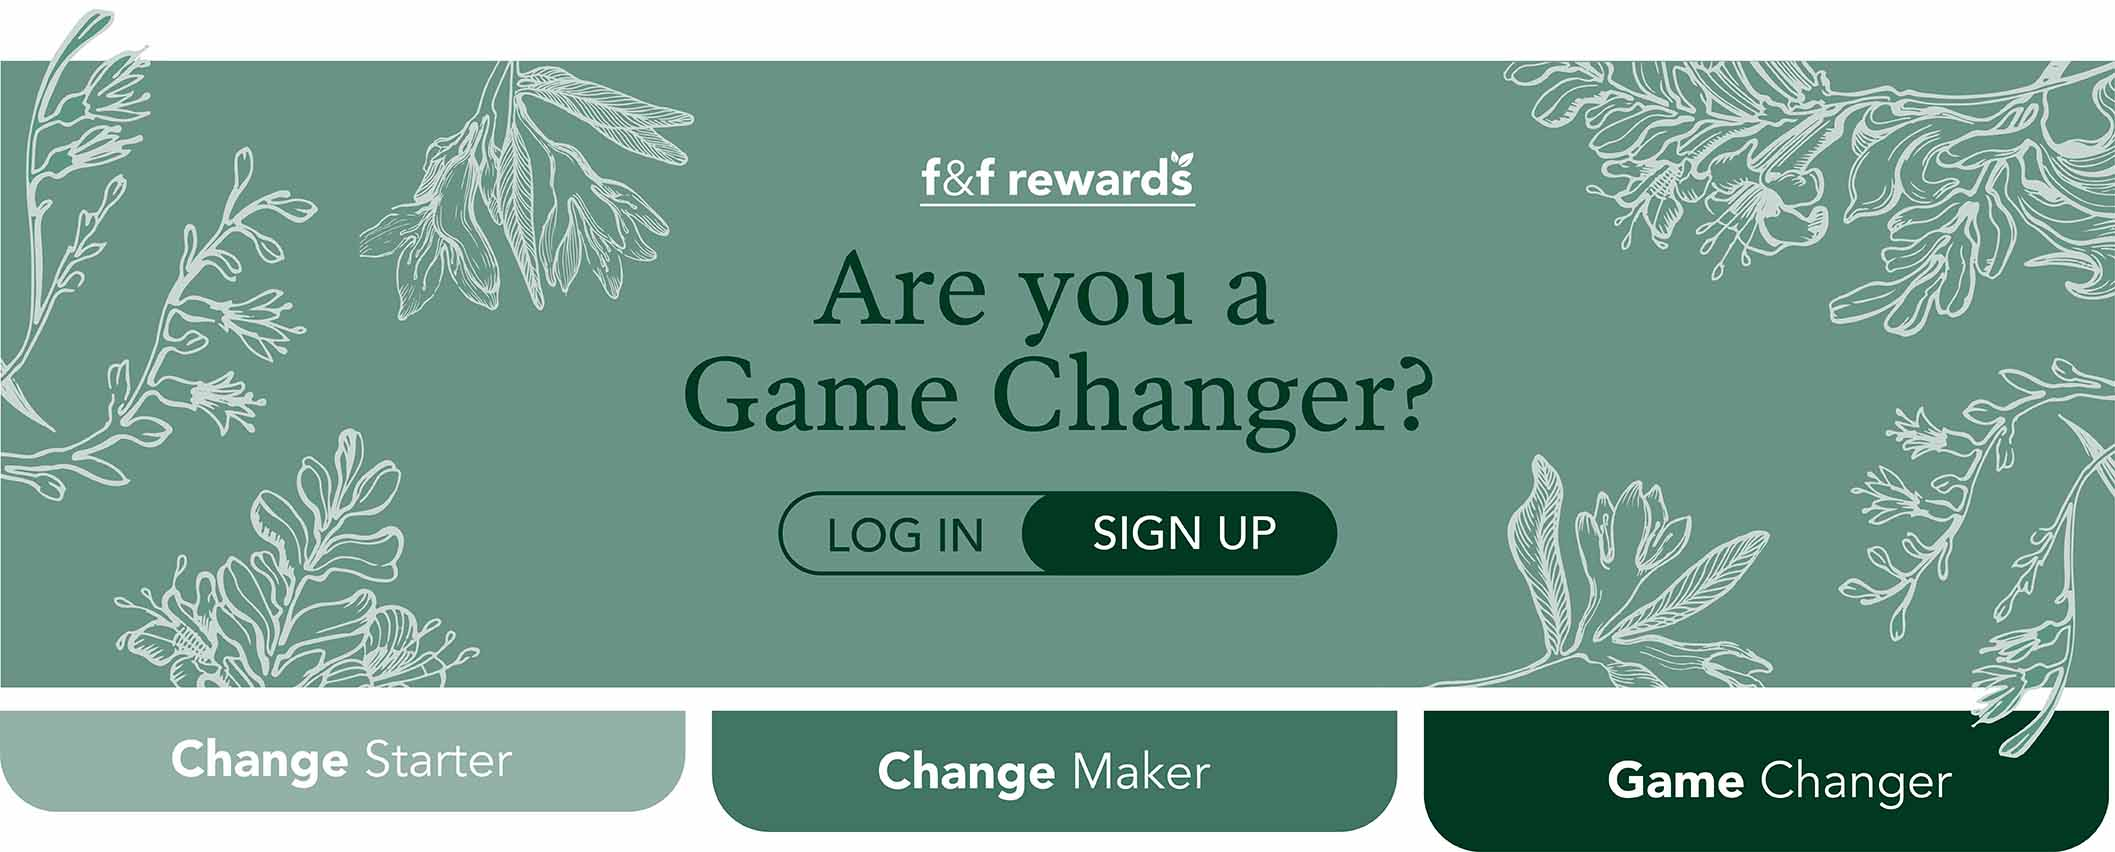 Join The Flora & Fauna Rewards Club